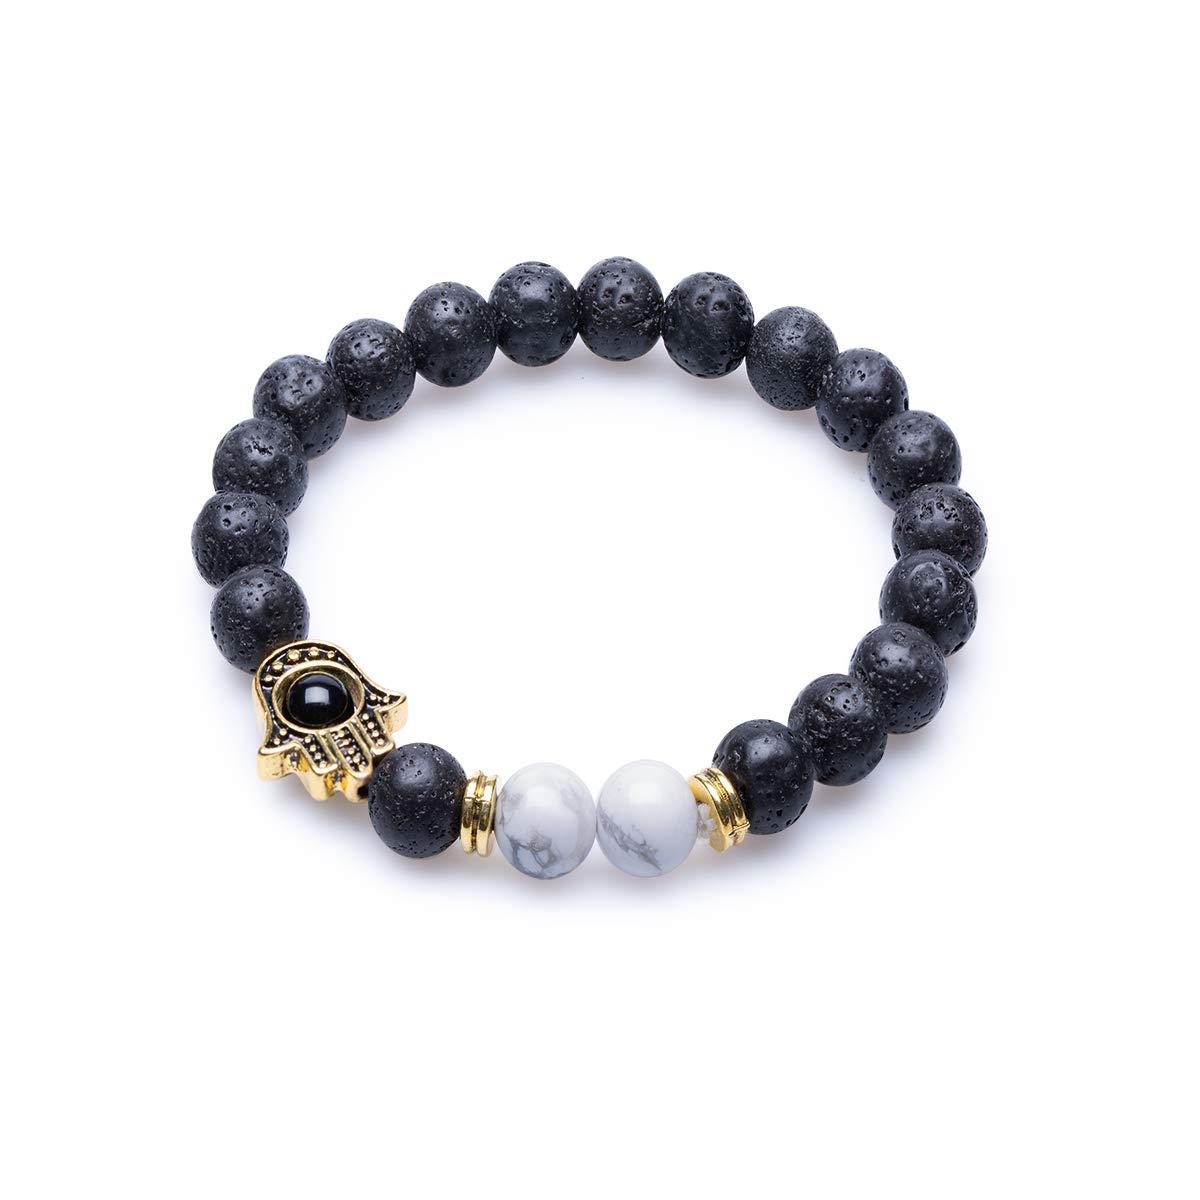 Lava Stone 8mm Reiki White Turquoise Healing Rock Bead Howlite Oil Diffuser Religion Hamsa Hand Elastic Bracelet QMLB QMLB121